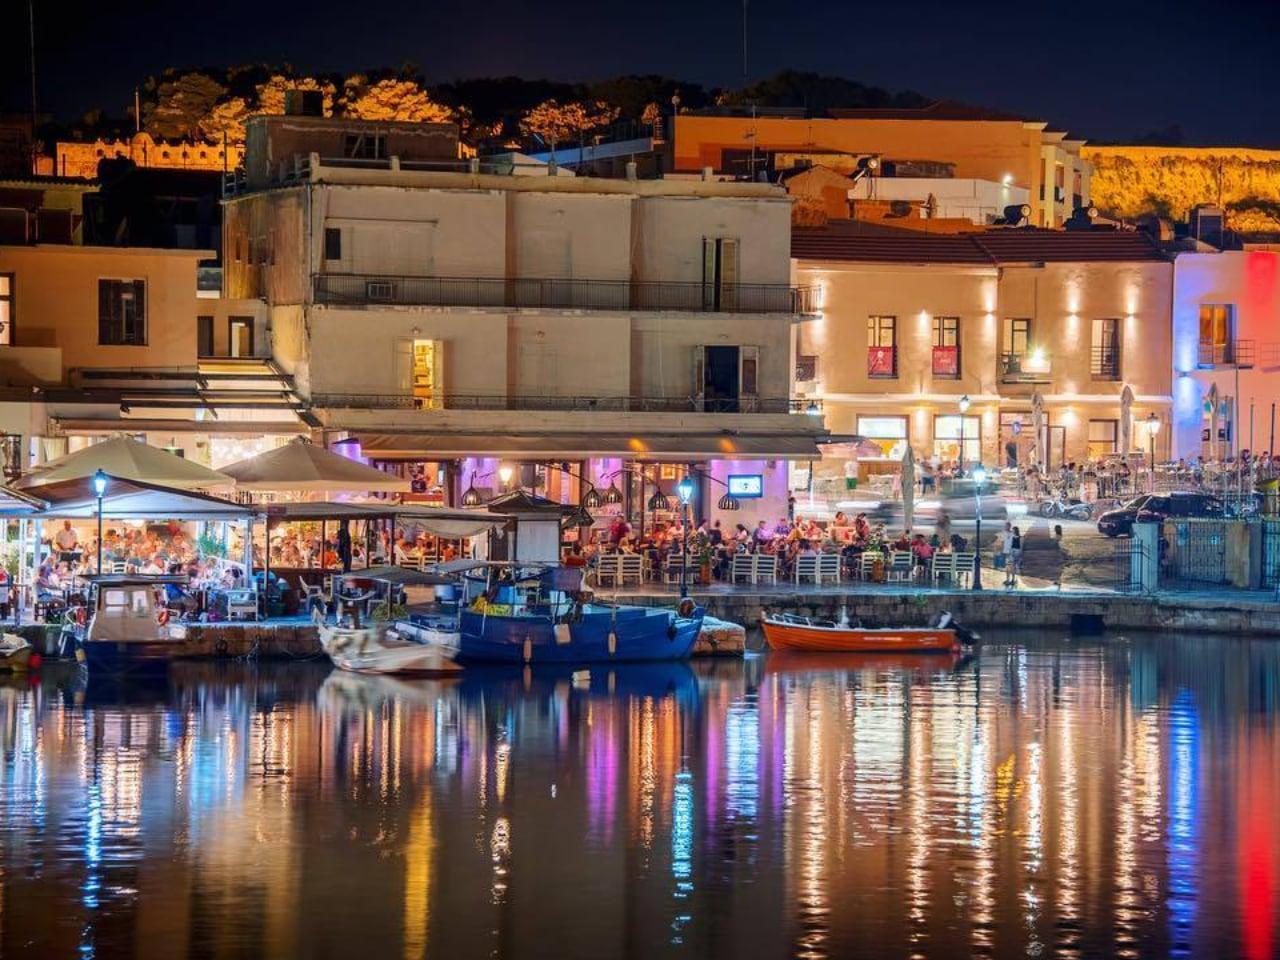 Rethymnon City Private Walking Tour, Rethimnon City - Private Walking Tour, best city tour rethimno crete, historical city tour rethymnon, rethymnon things to do, rethymnon best activities